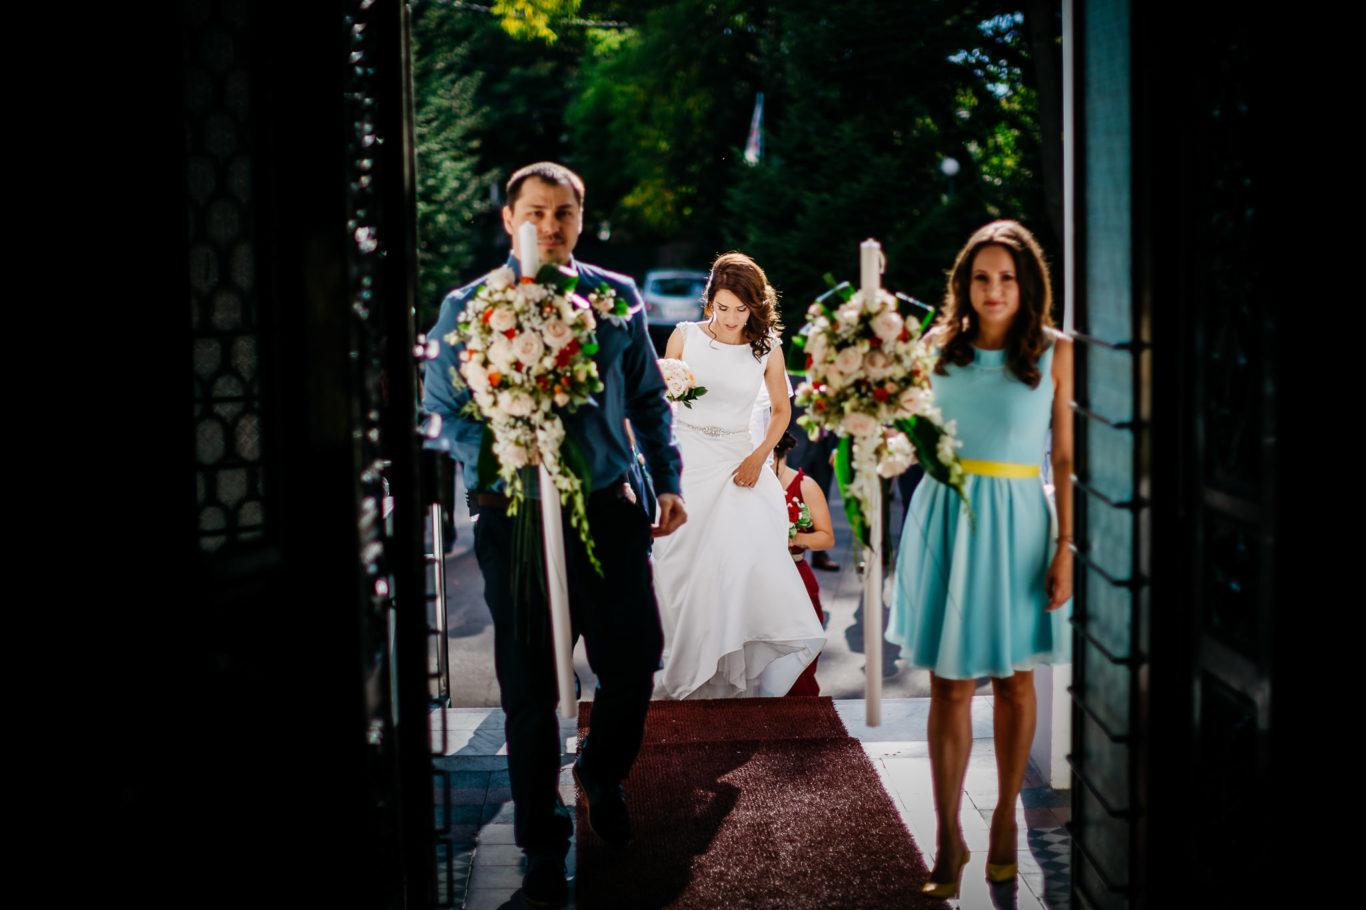 0397-fotografie-nunta-bucuresti-dana-radu-fotograf-ciprian-dumitrescu-cd2_7263